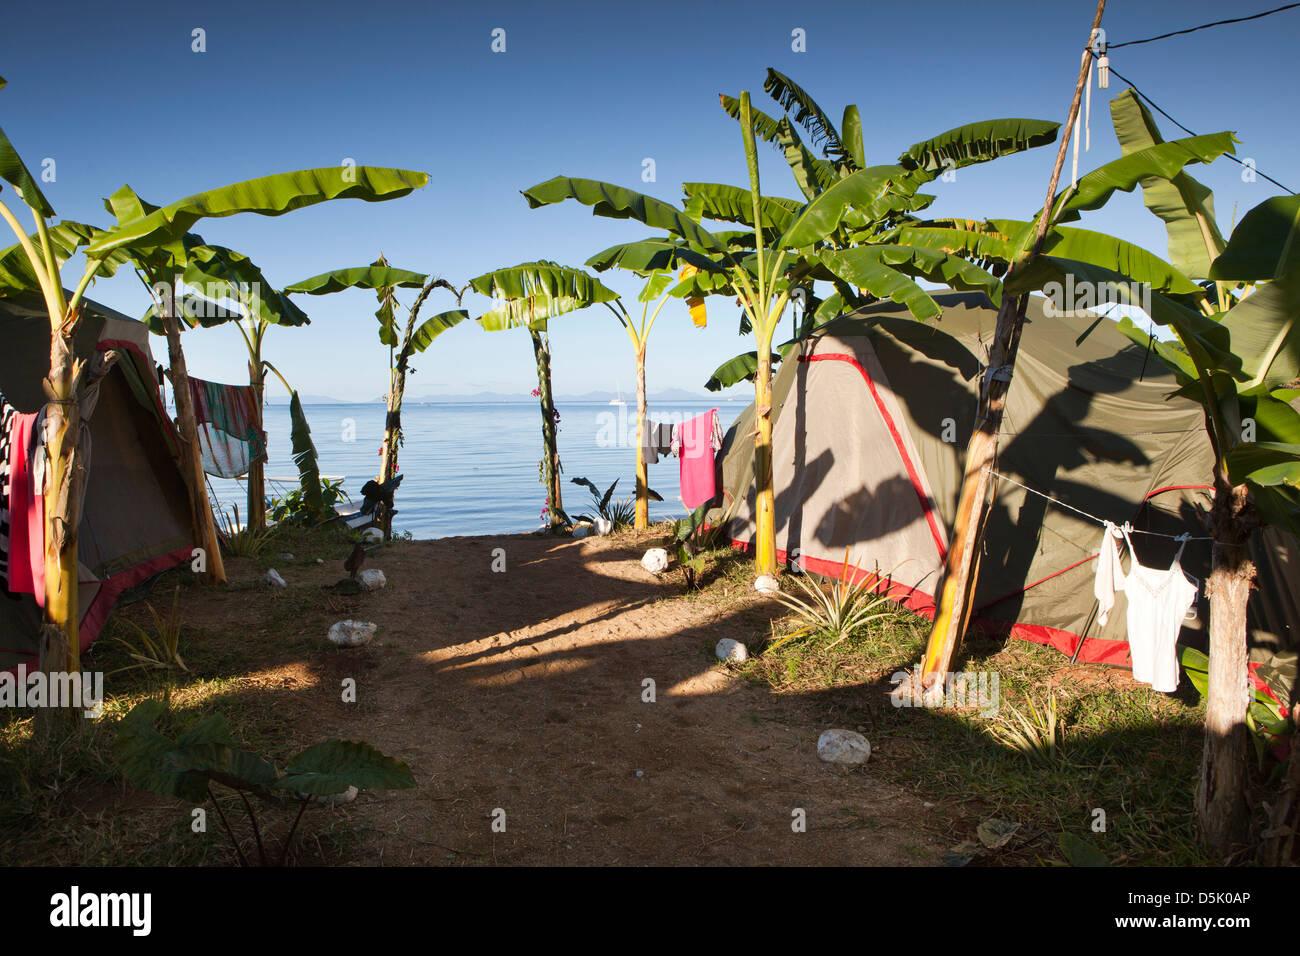 Madagascar, Nosy Be, Marodokana, Operation Wallacea diving camp tents - Stock Image